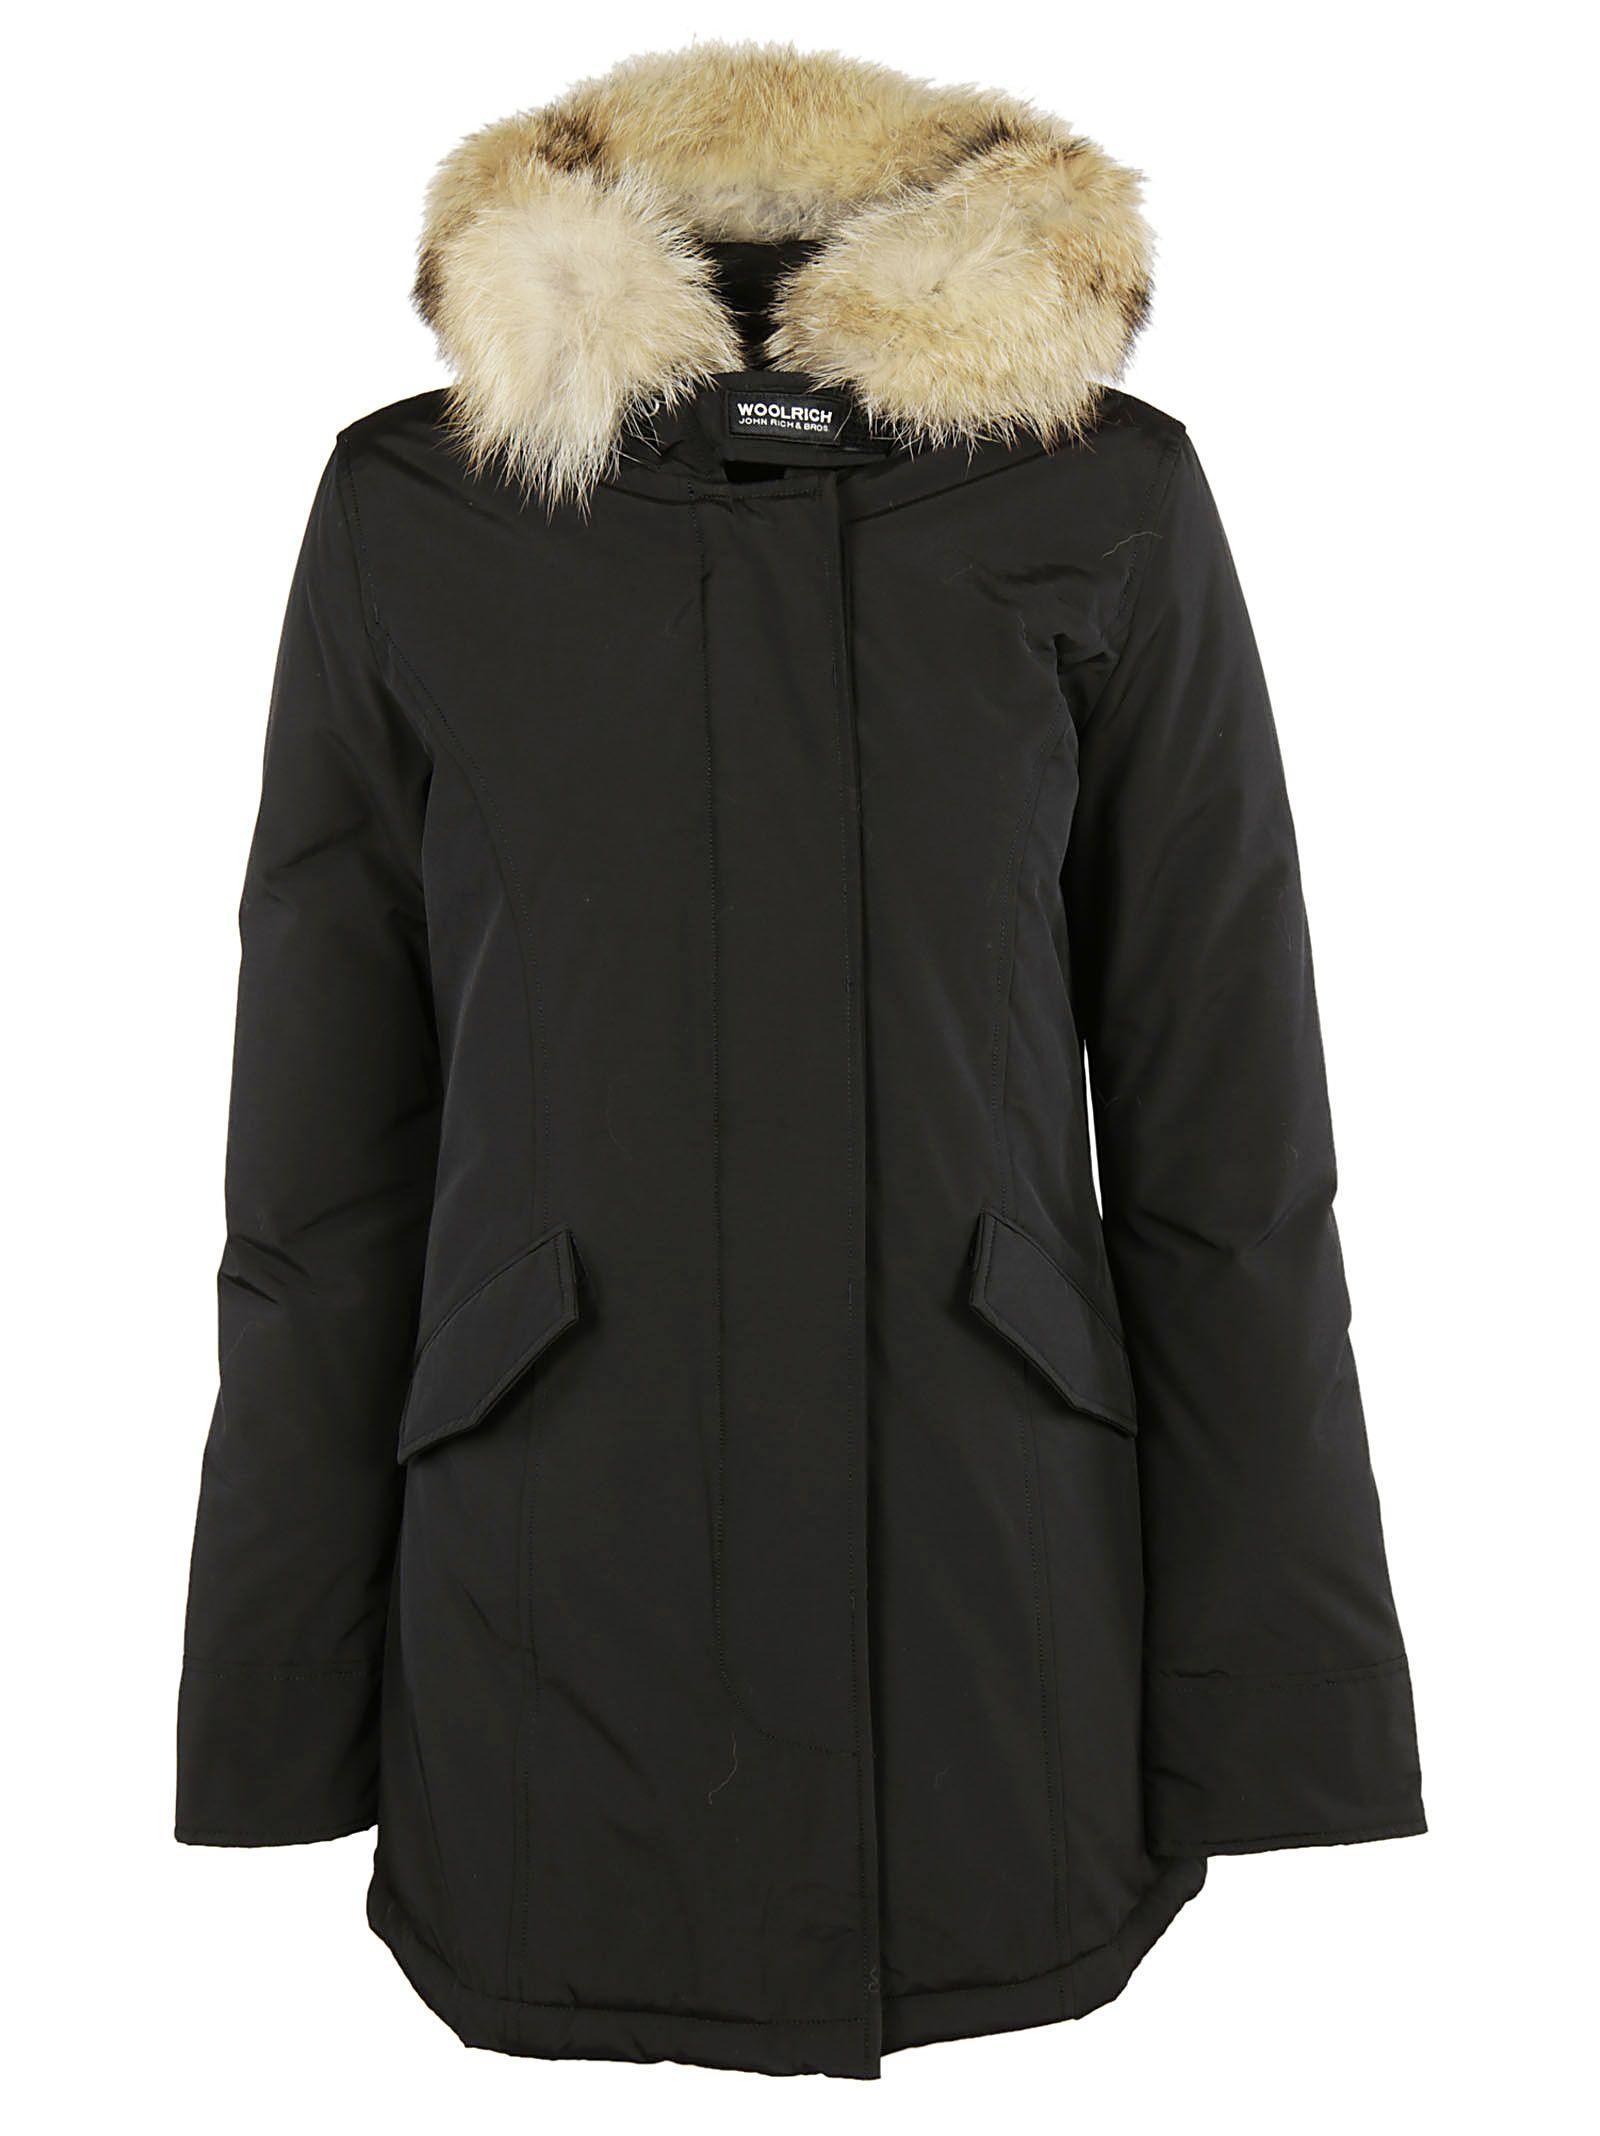 Woolrich Fur-trim Padded Parka In Black